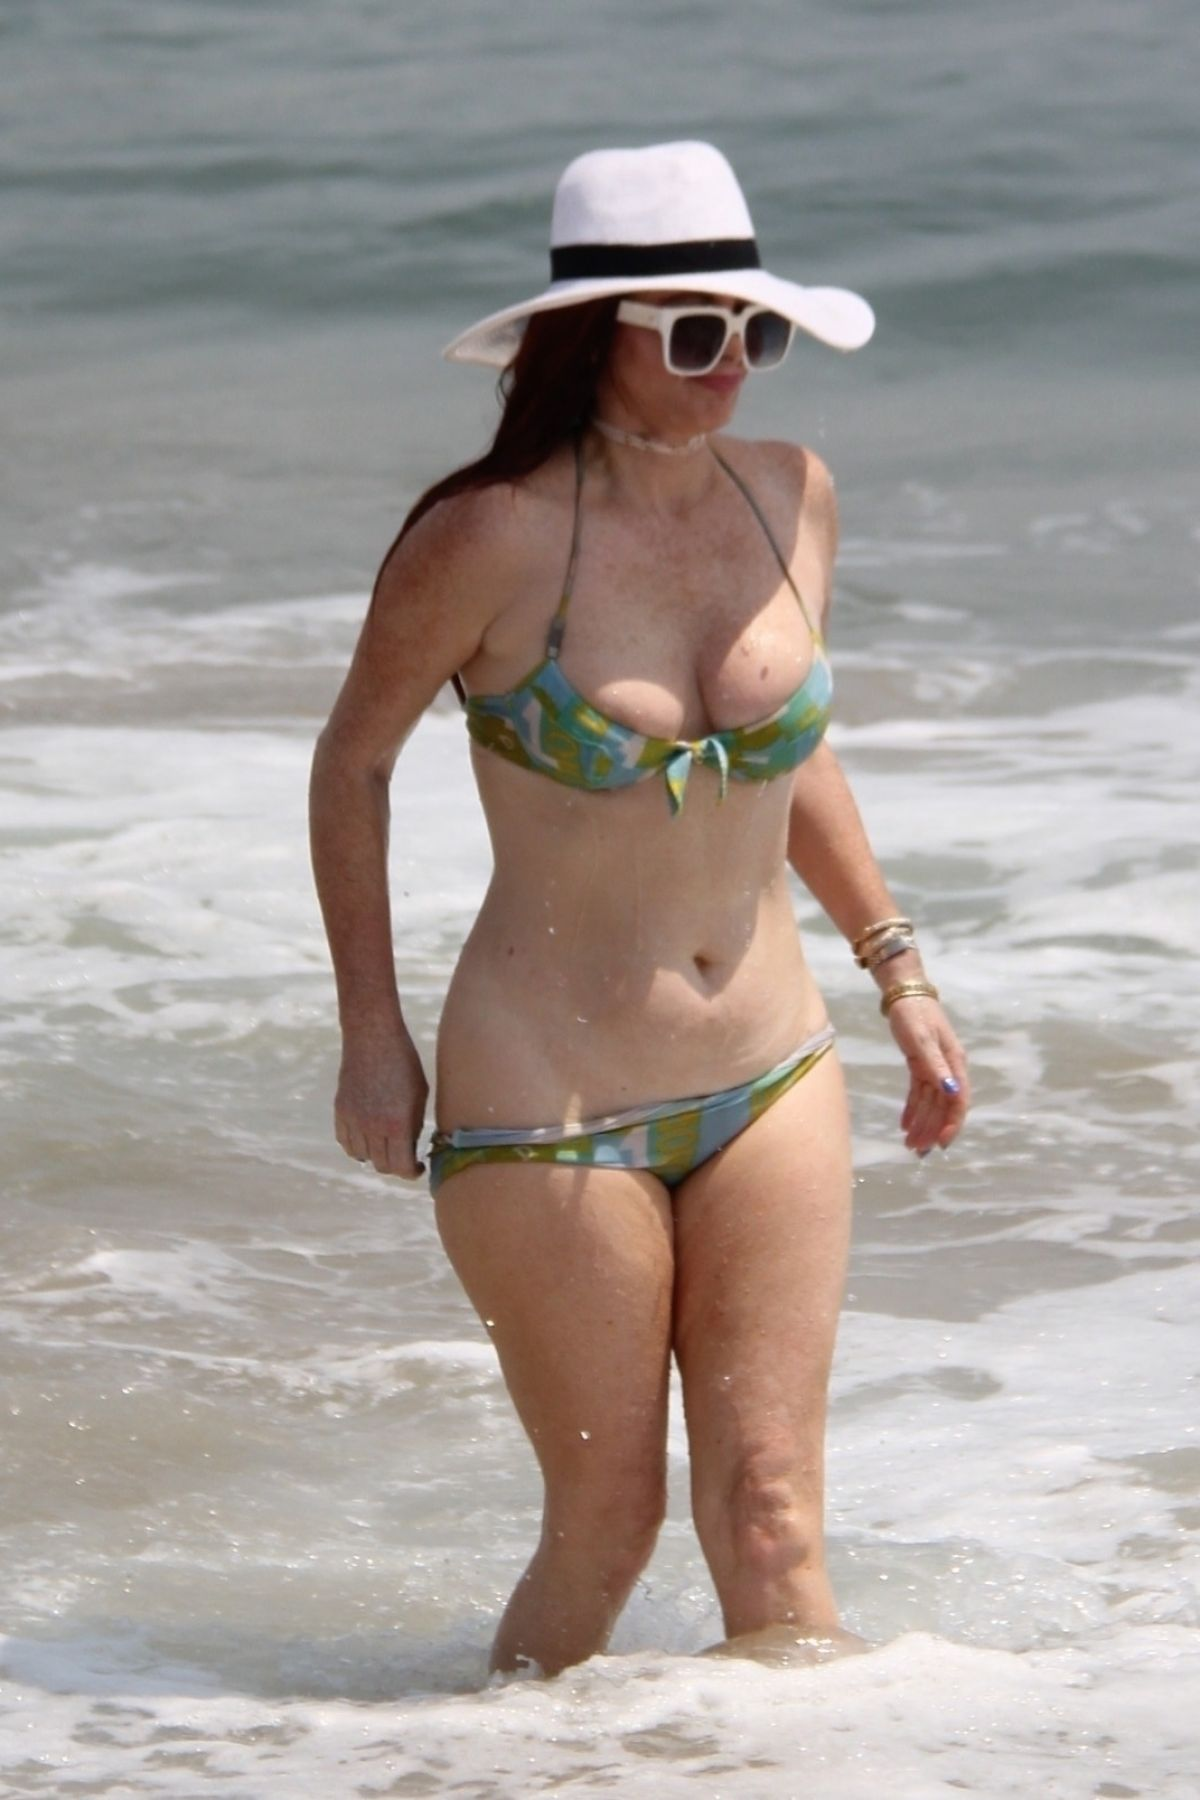 Bikini Phoebe Price nude (42 photos), Topless, Is a cute, Boobs, underwear 2020